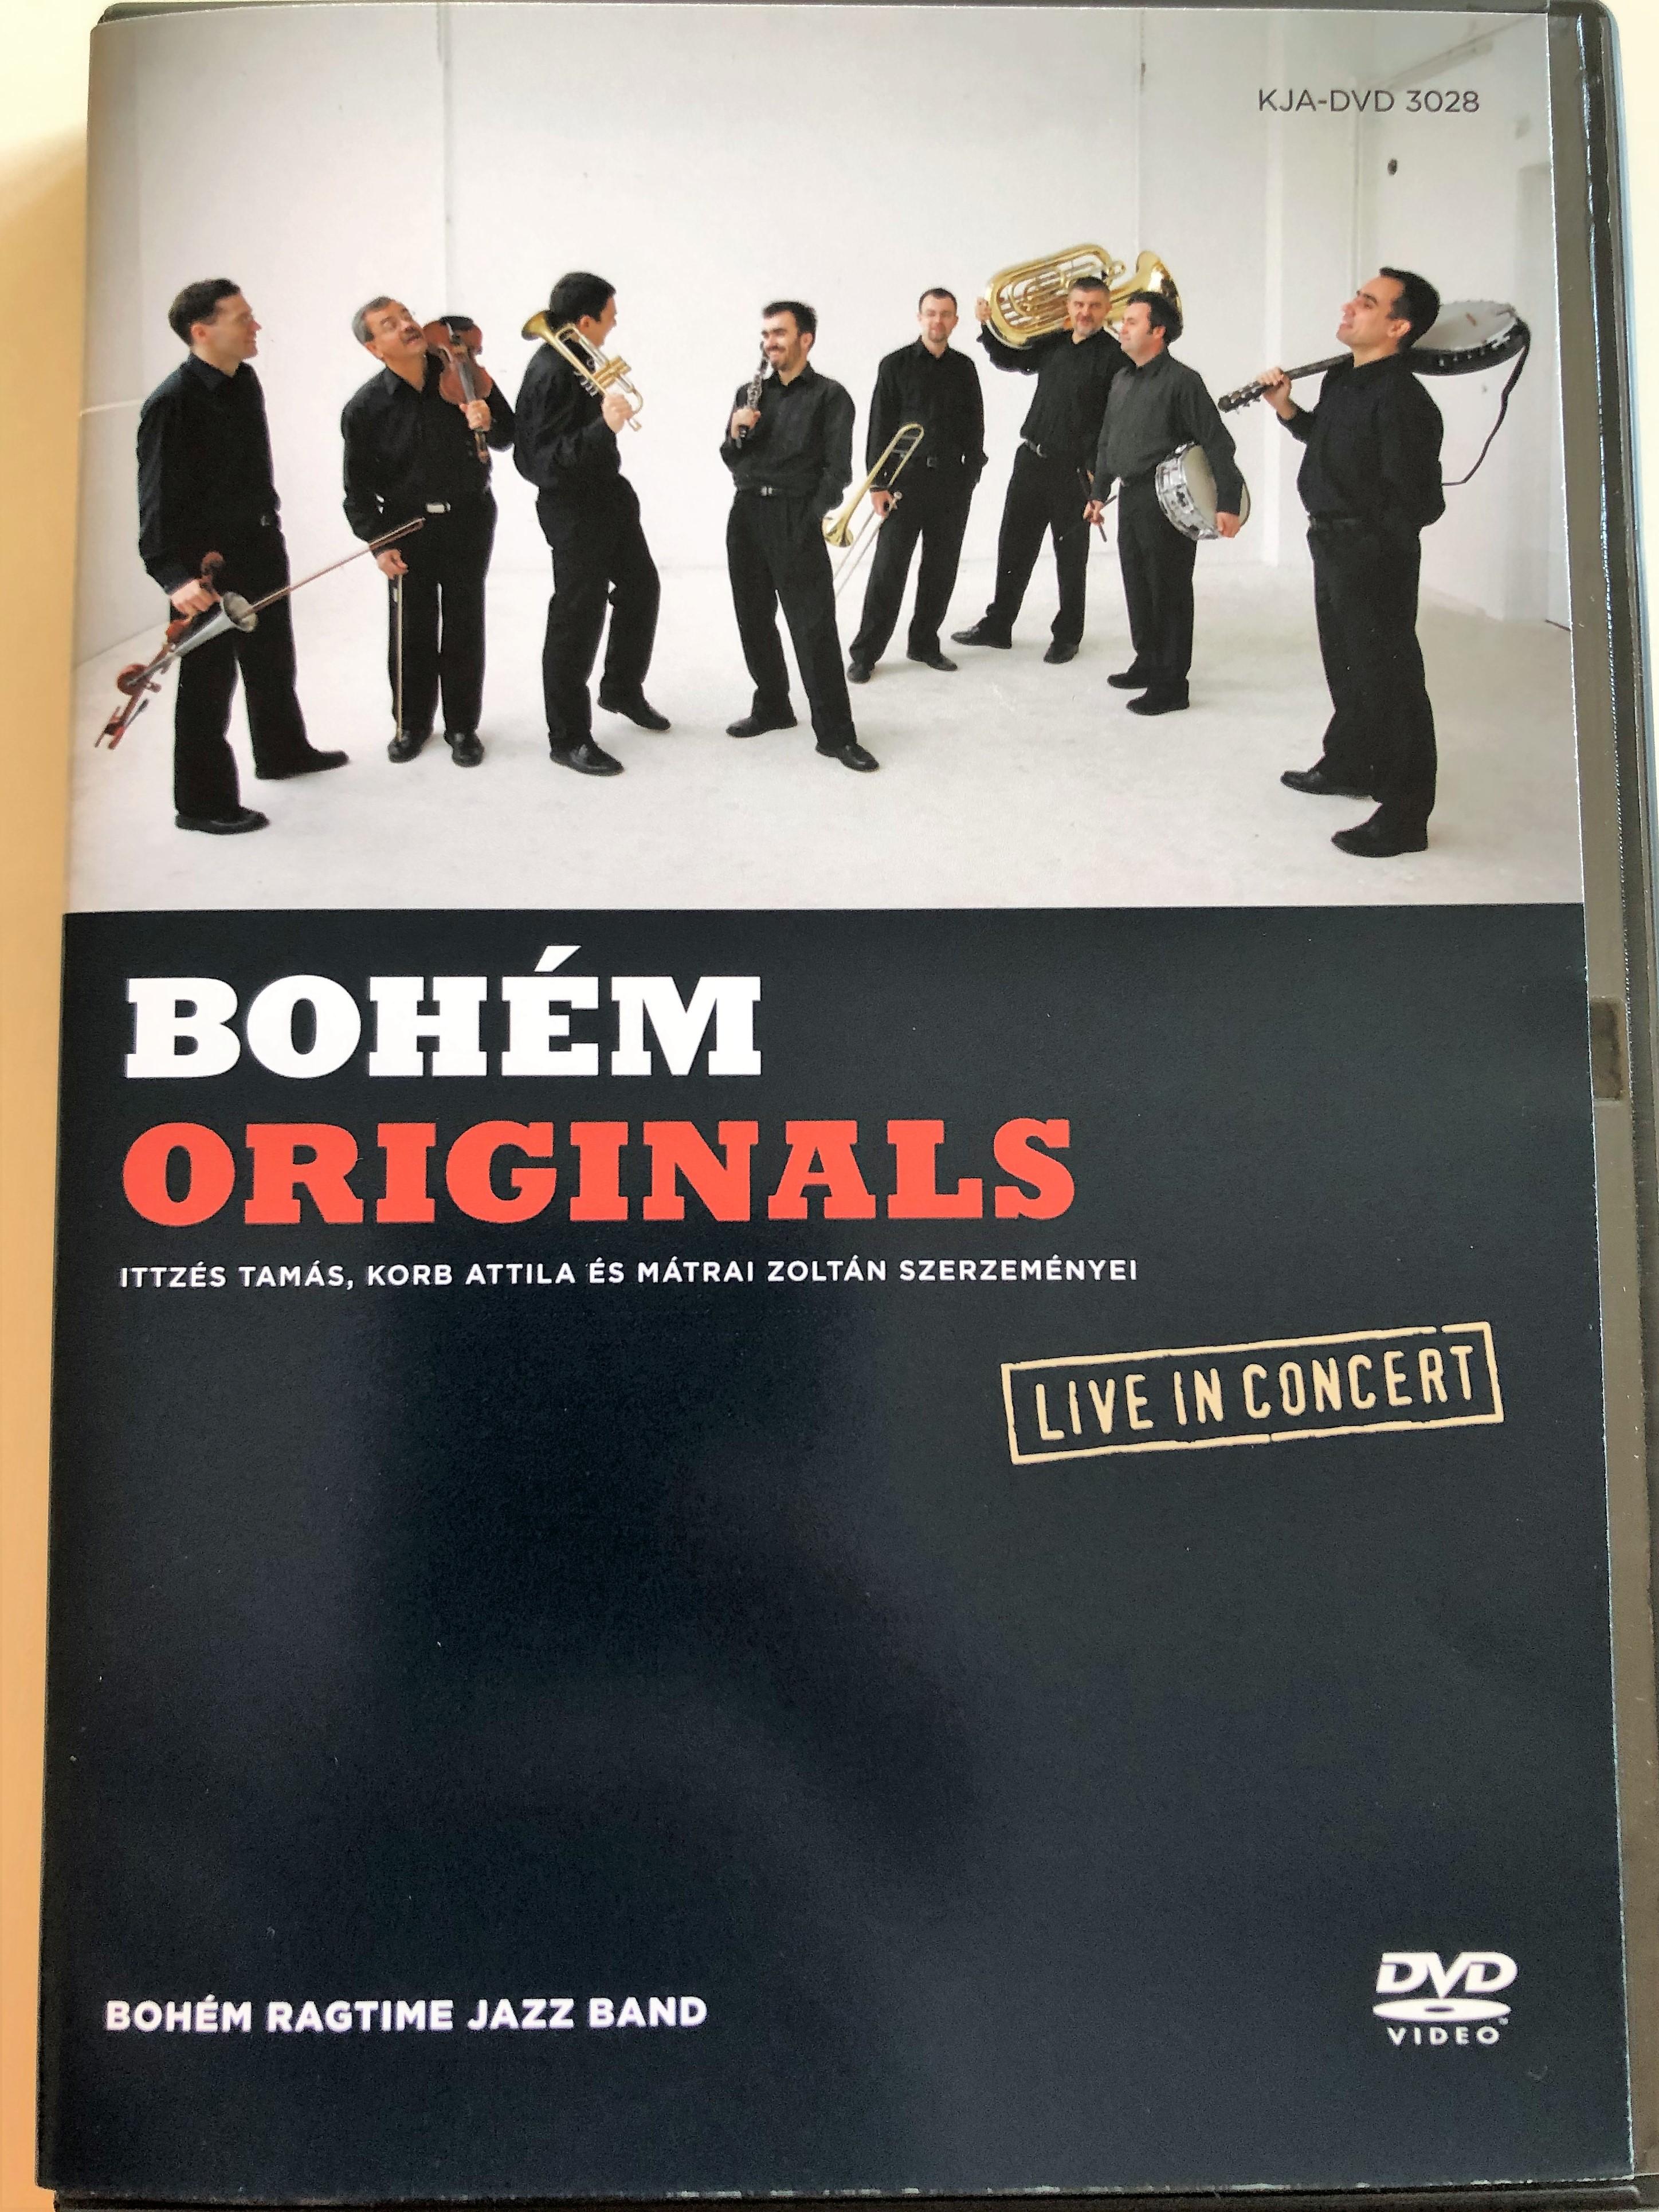 boh-m-originals-dvd-2013-live-in-concert-ittz-s-tam-s-korb-attila-m-trai-zolt-n-boh-m-ragtime-jazz-band-1-.jpg